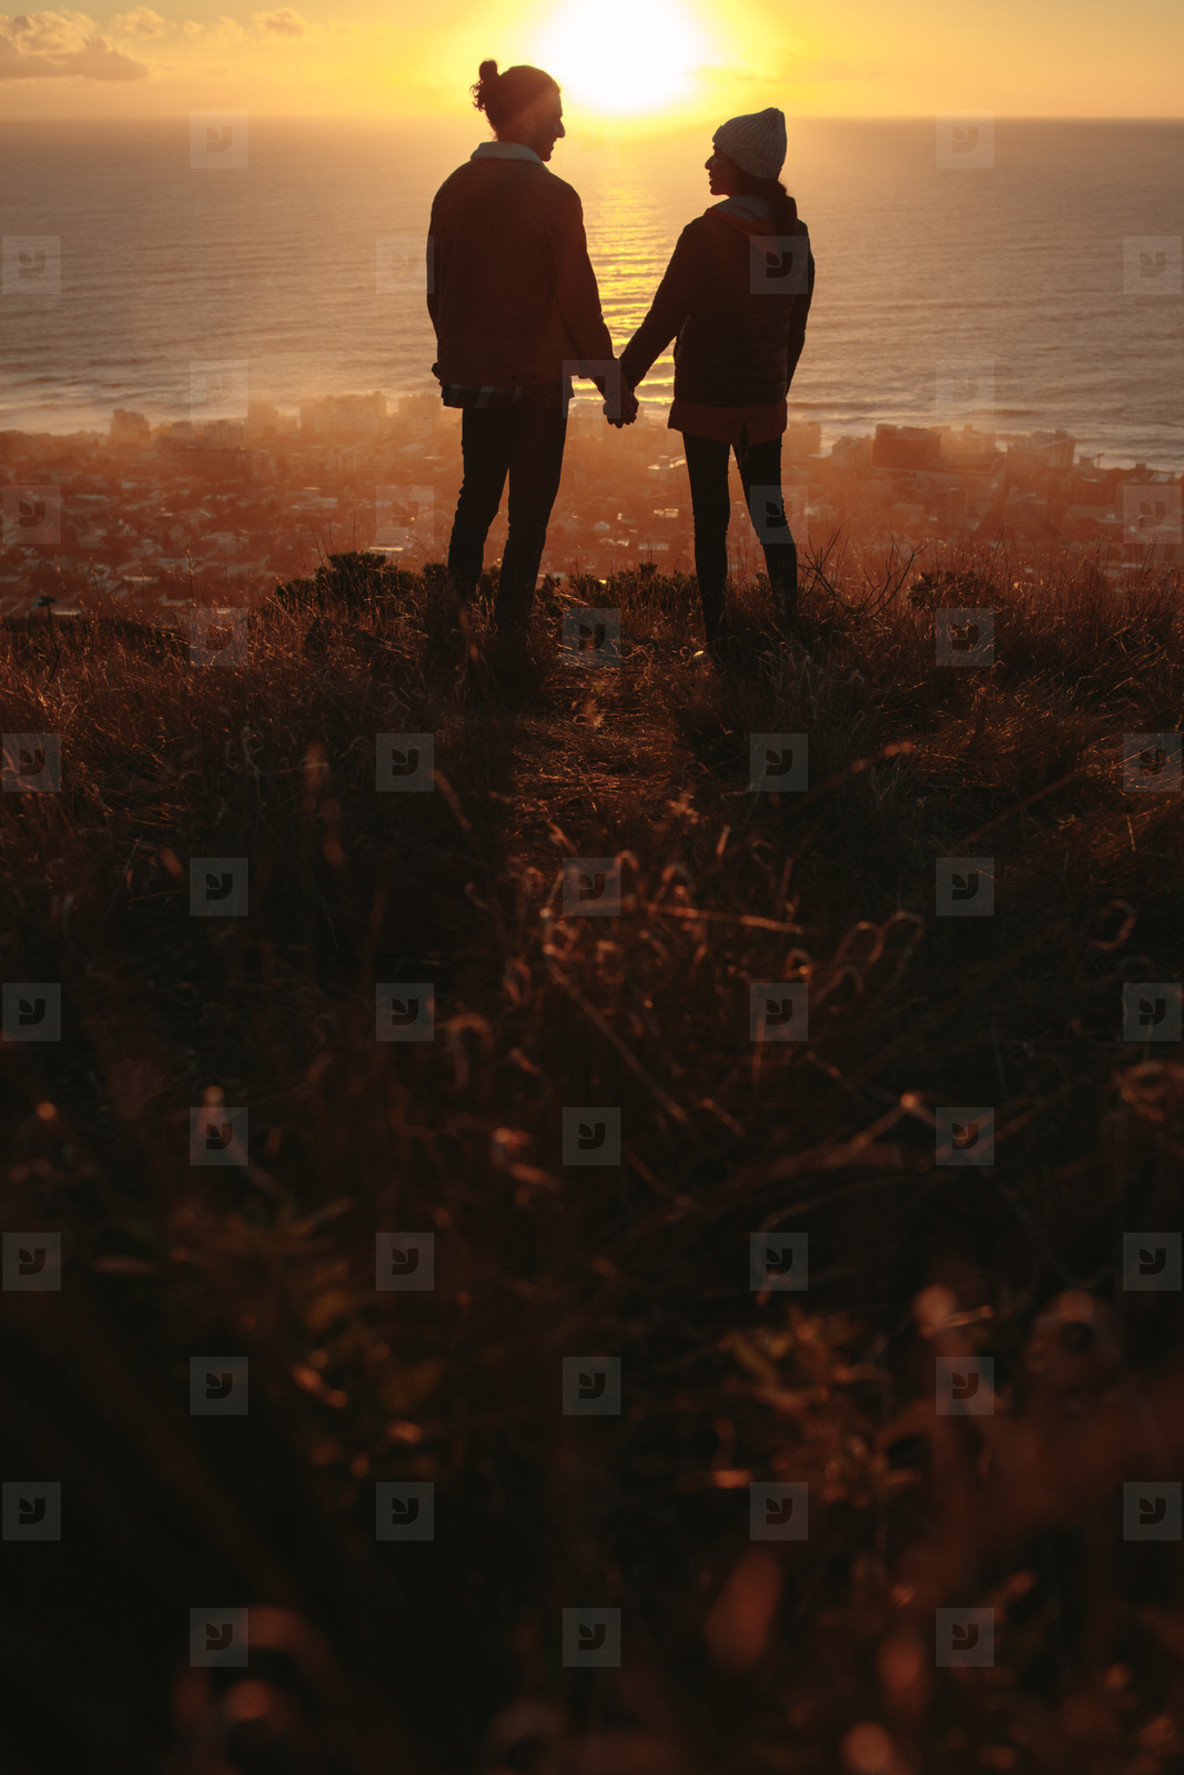 Photos Loving Couple On Mountain Peak During Sunset Youworkforthem